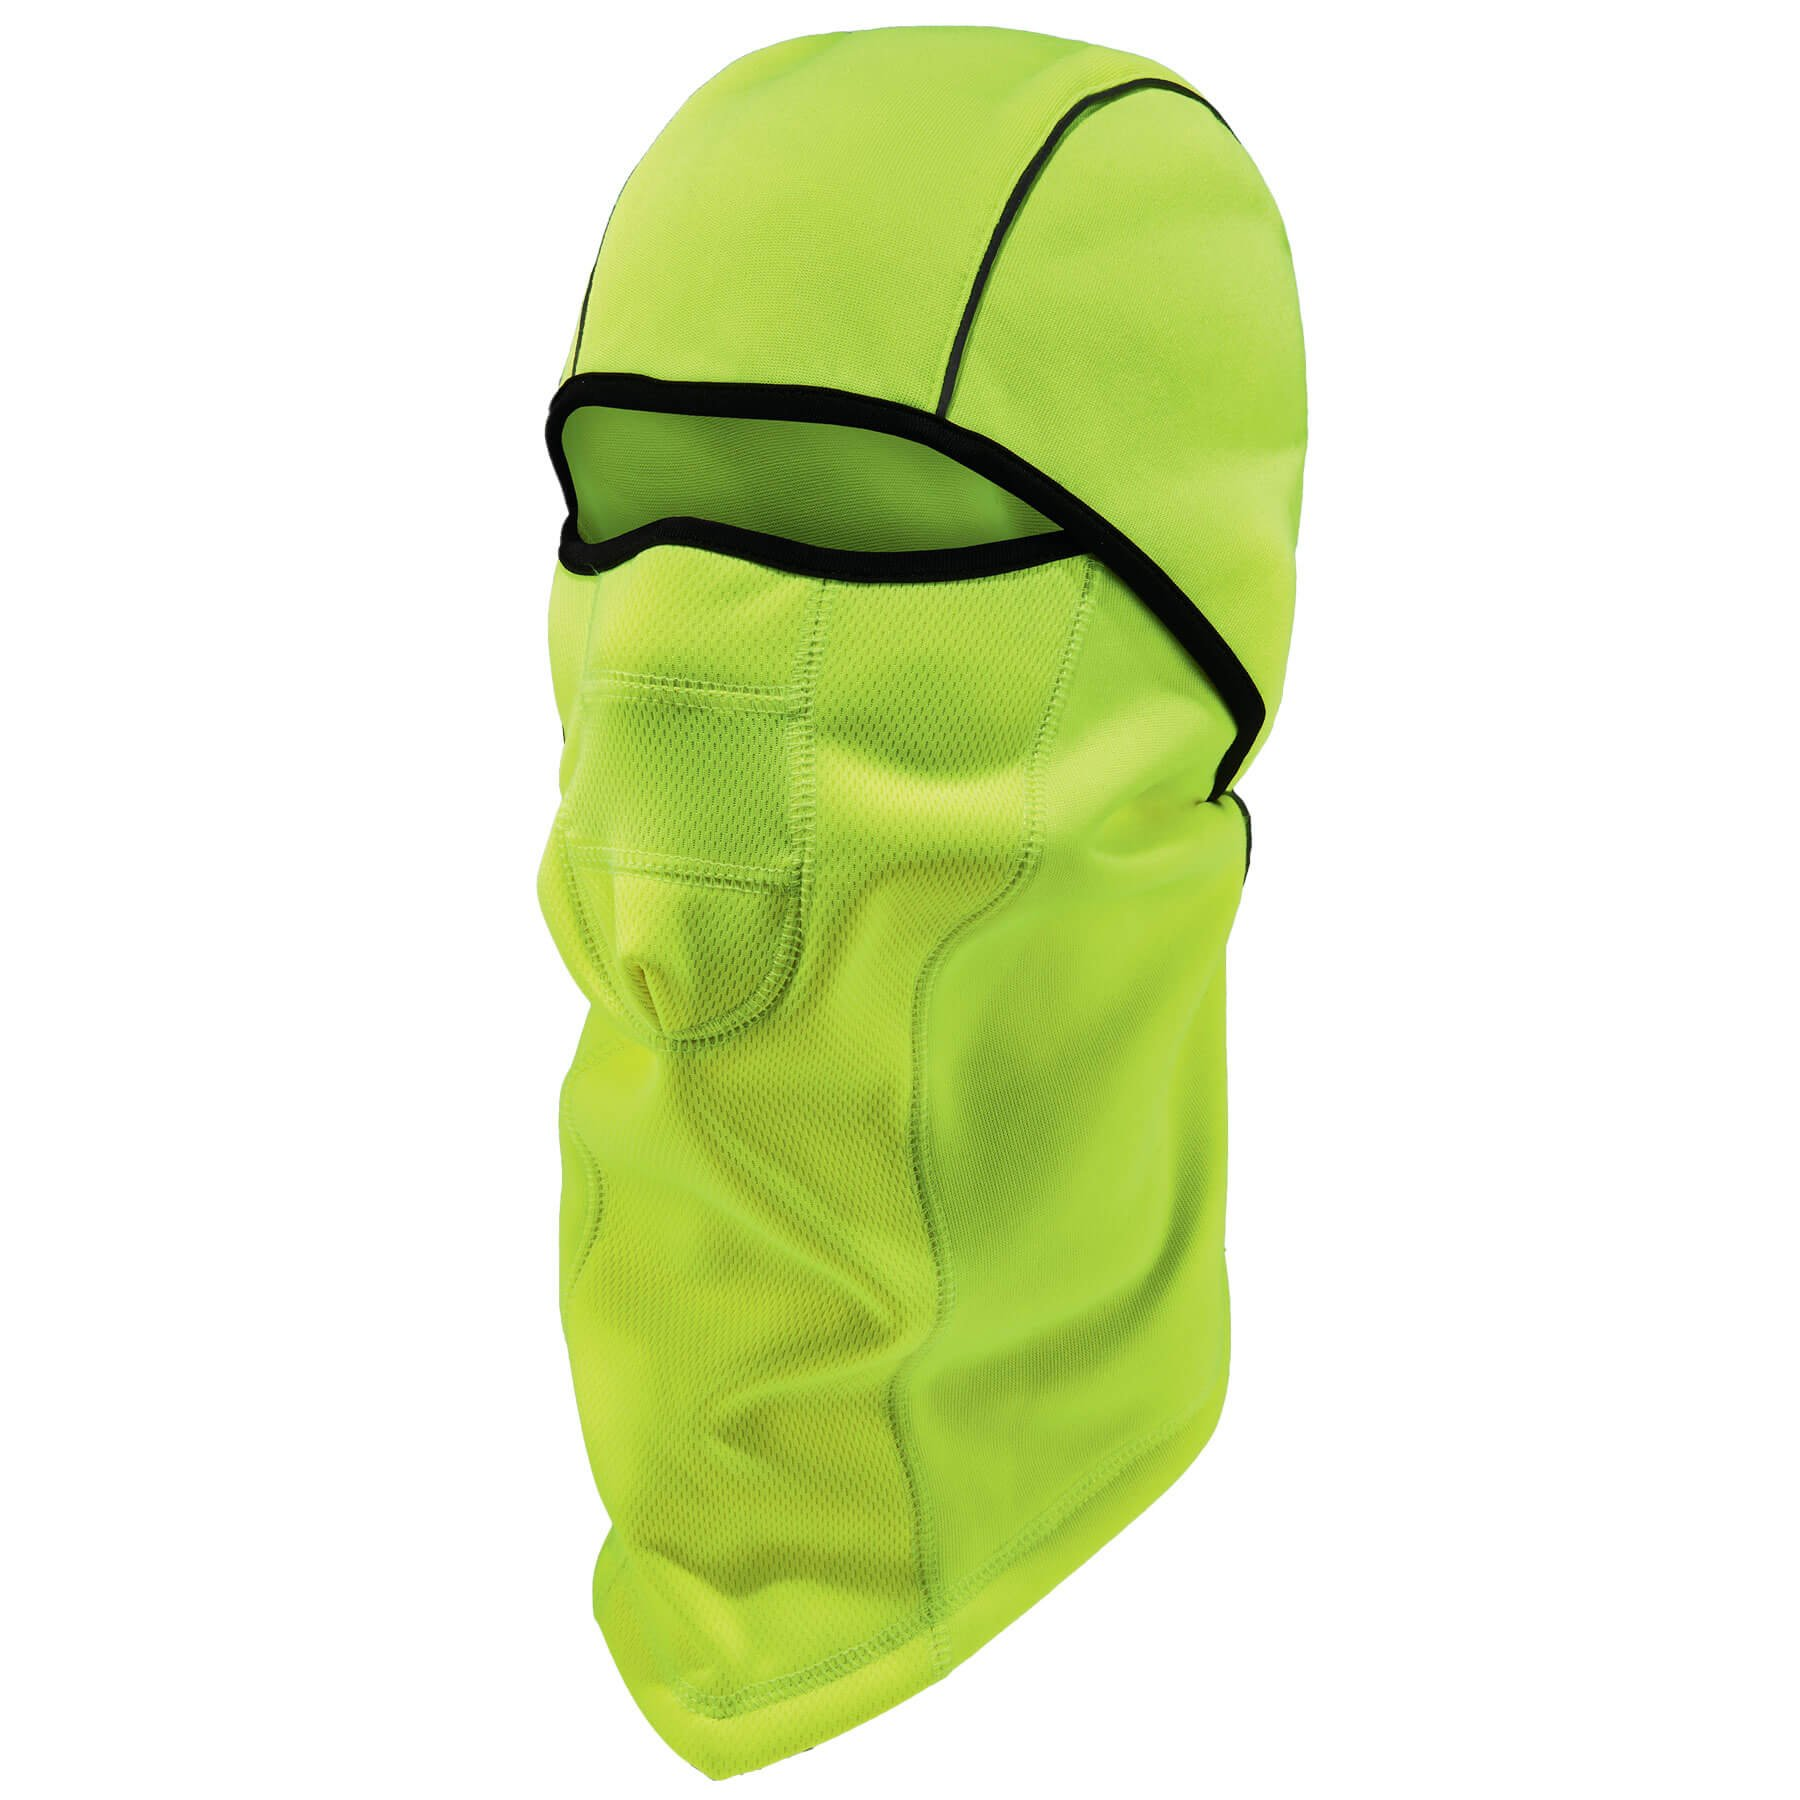 Ergodyne N-Ferno 6823 Thermal Fleece Wind-Resistant Hinged Balaclava, One Size, Lime